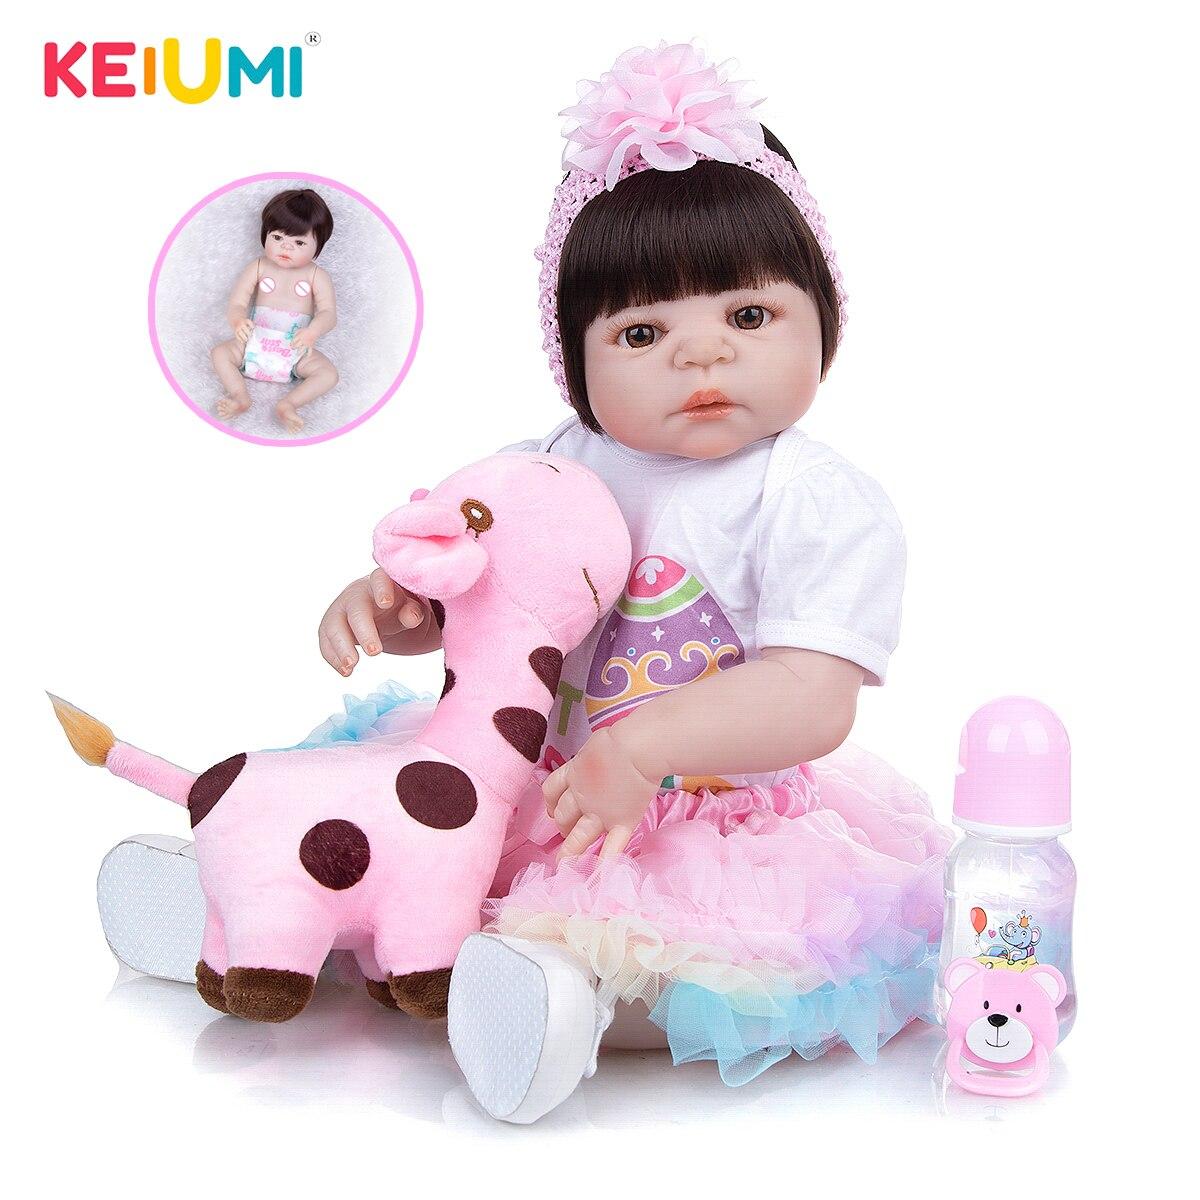 KEIUMI New Arrival Toy Reborn Baby Dolls Full Silicone Vinyl Body Lifelike 23 Inch Babies Dolls Girl Birthday Gift For Sale